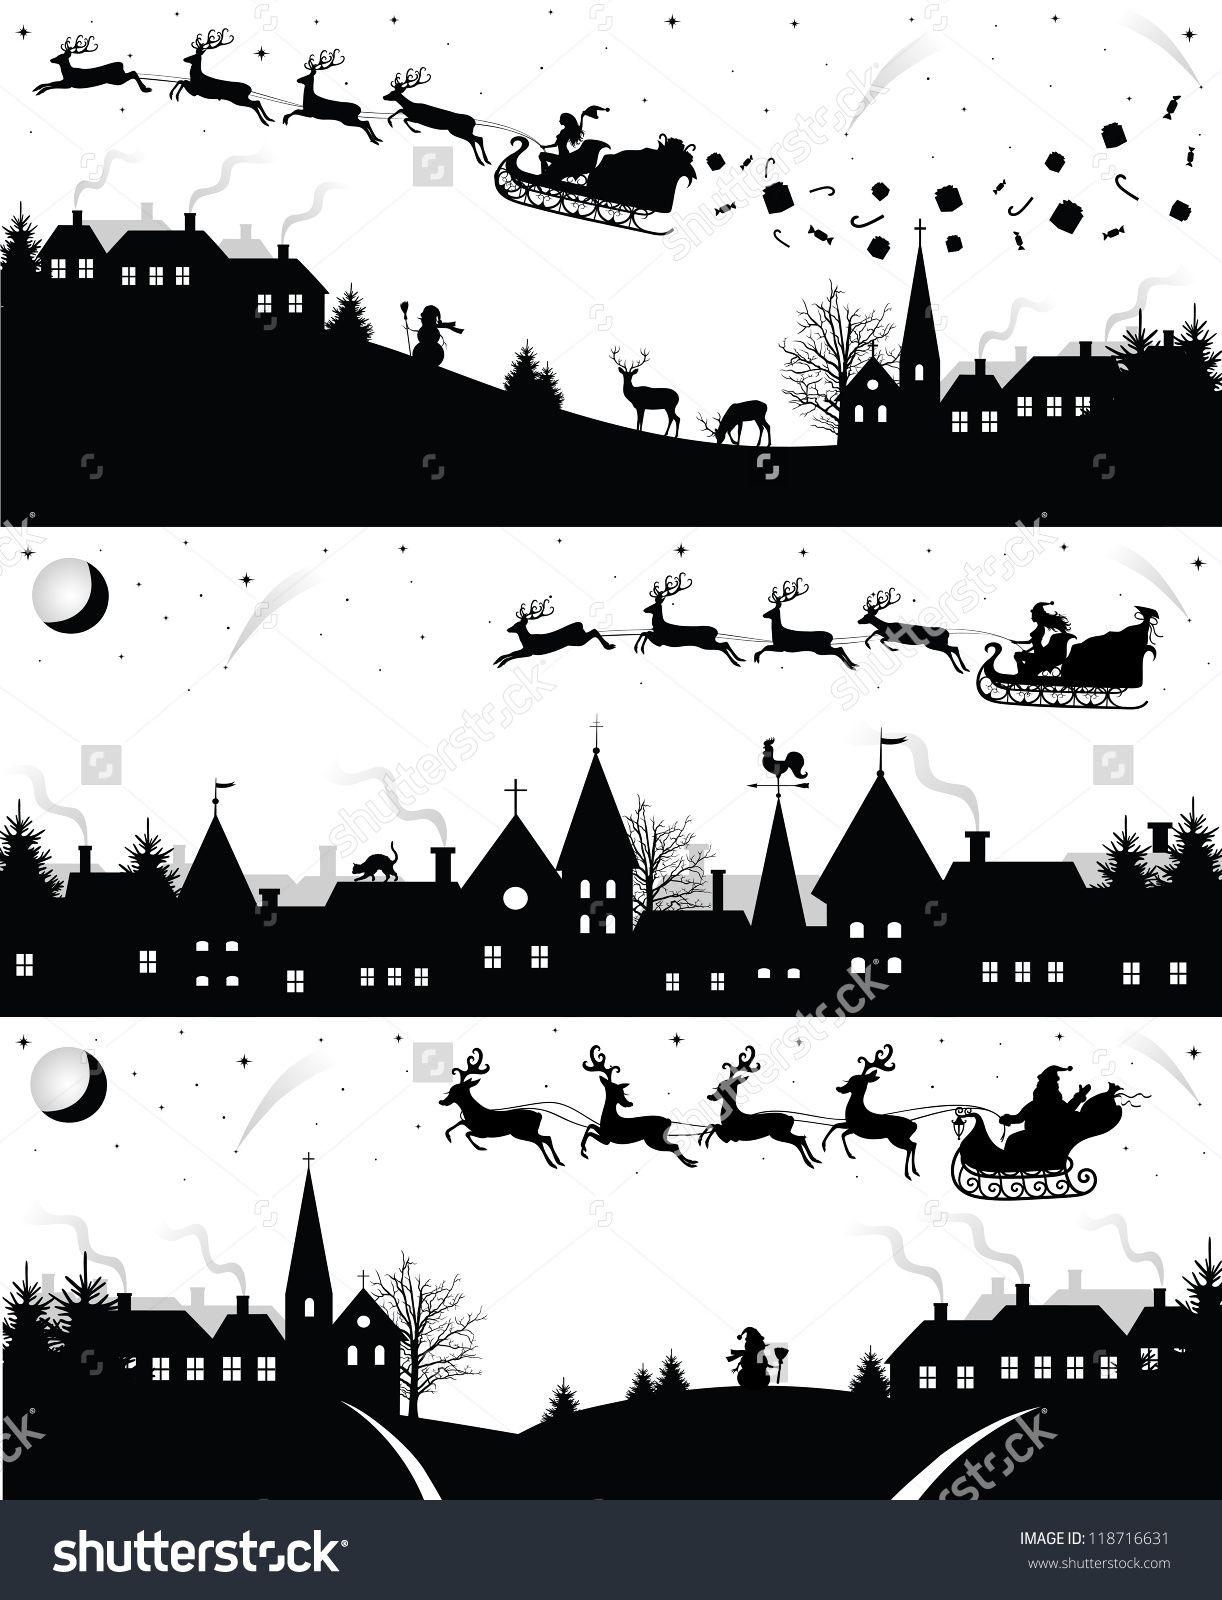 Set Of Christmas Silhouettes. Illustration vectorielle